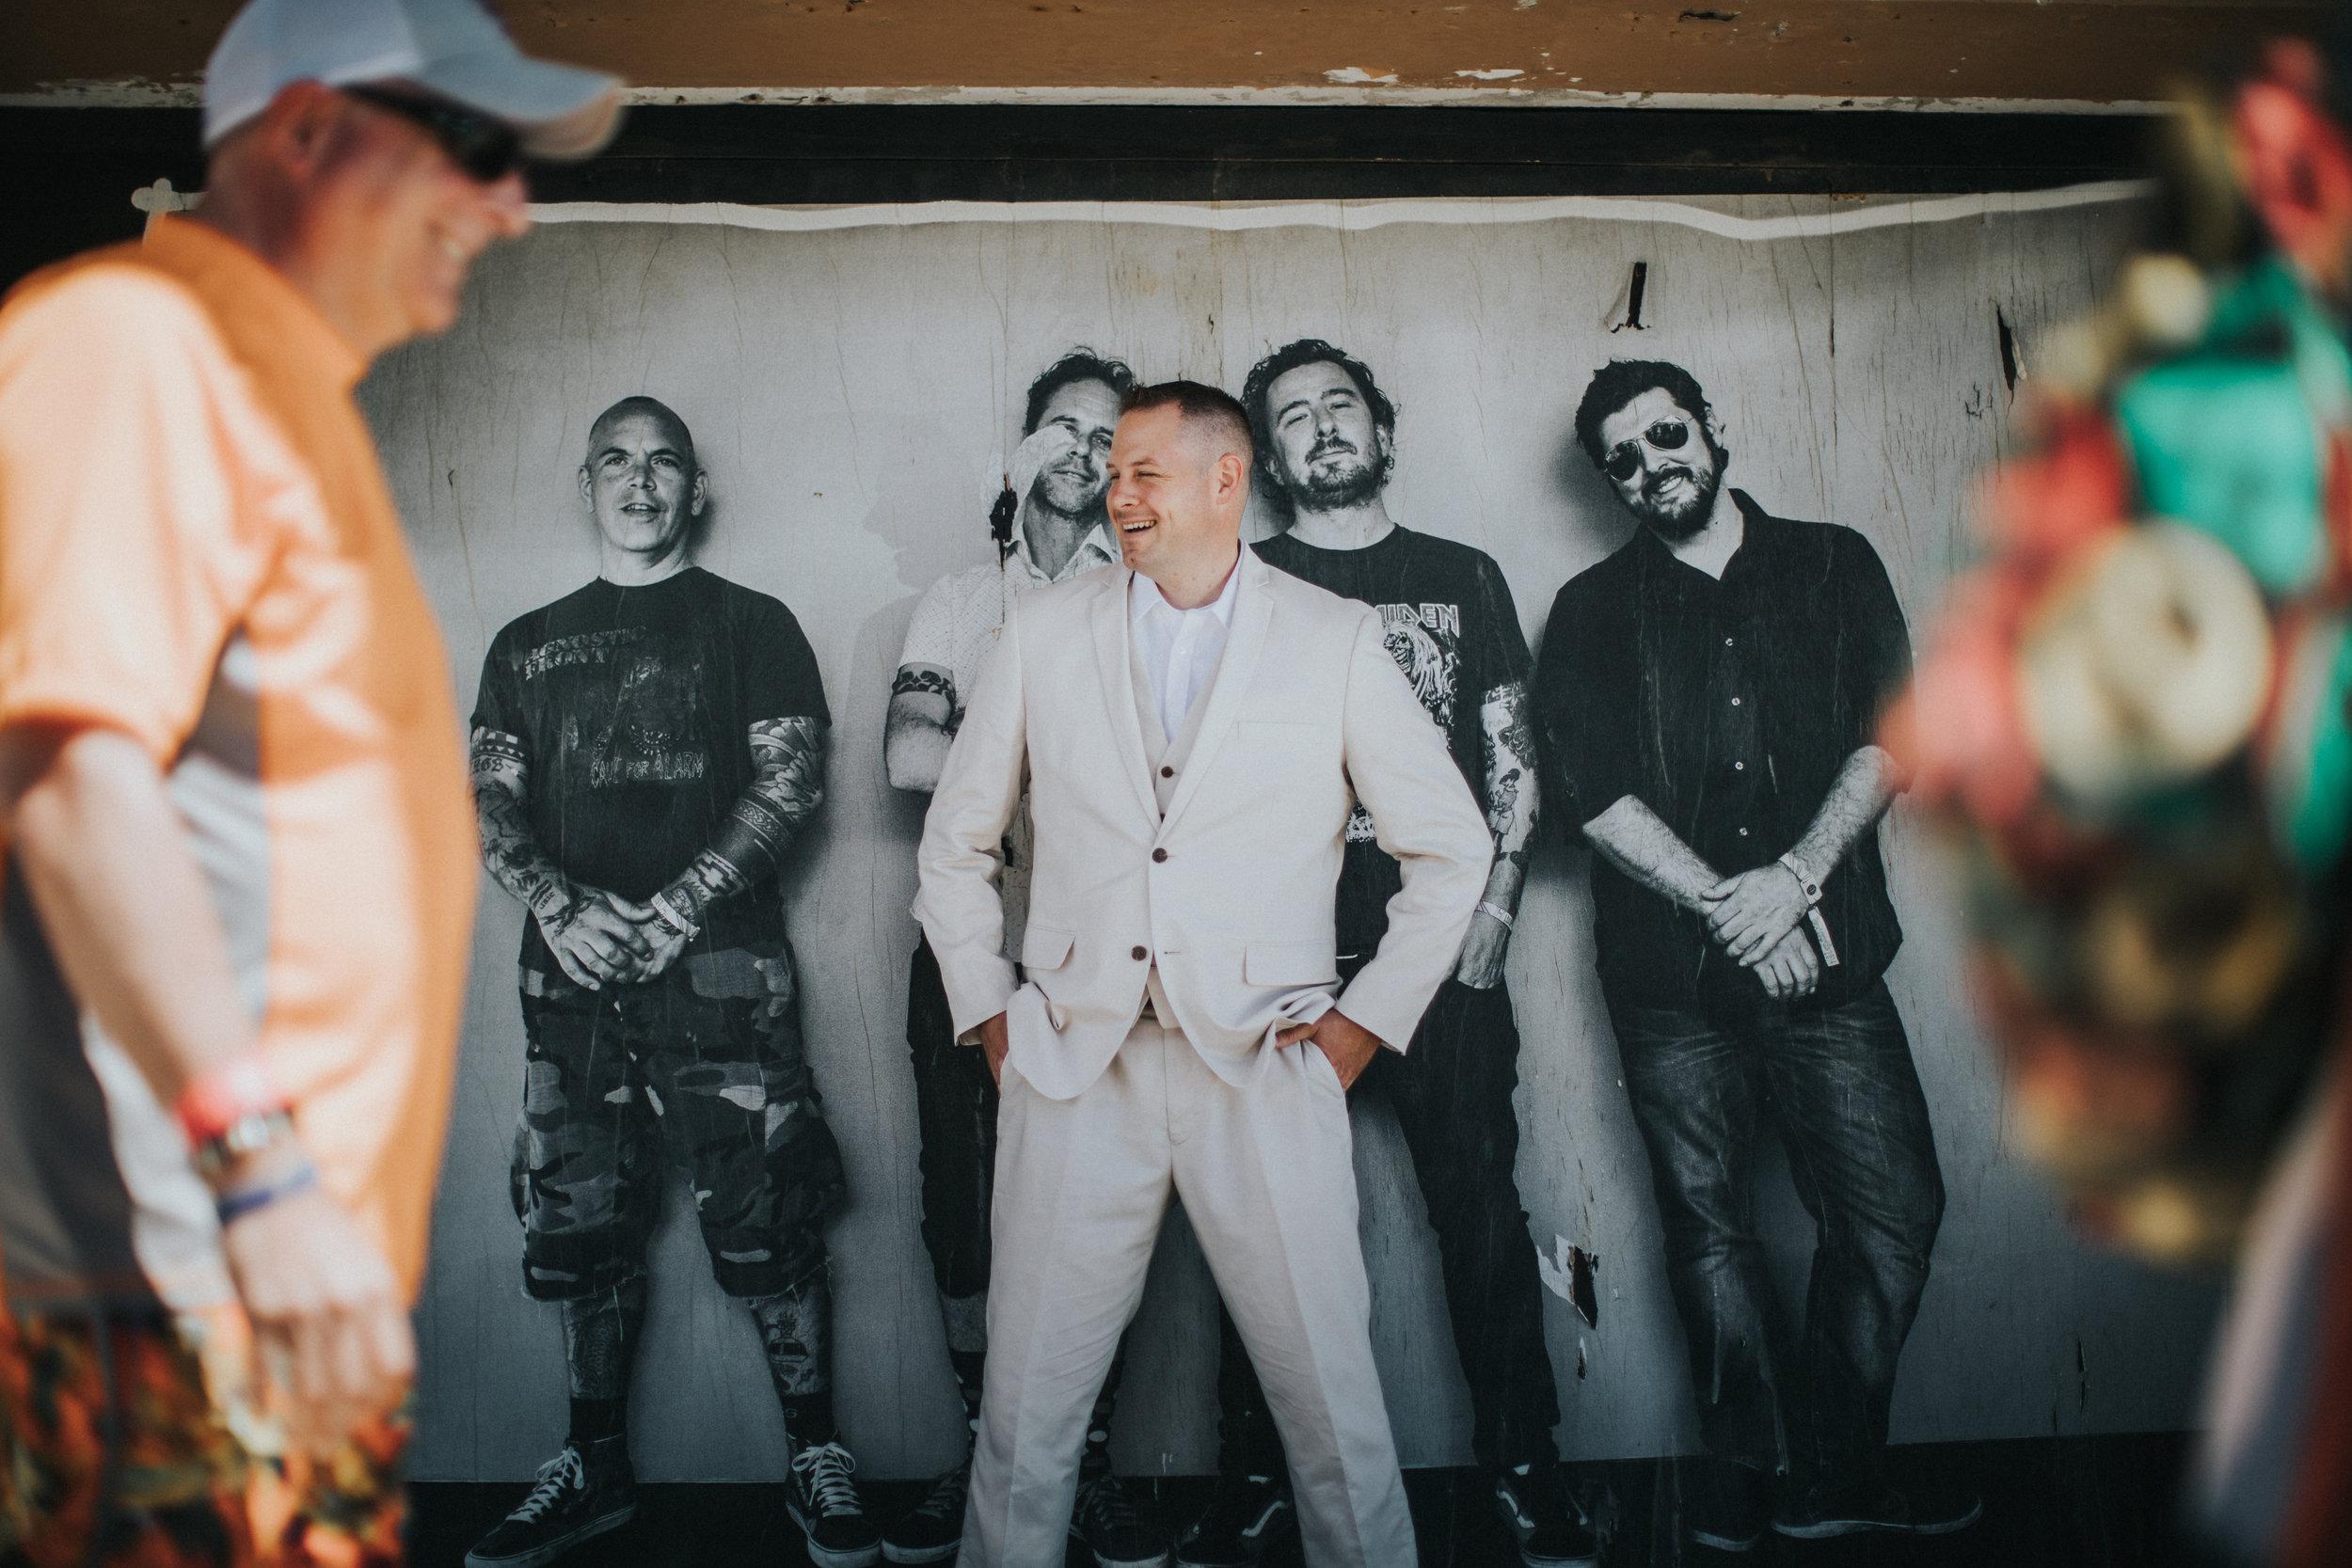 JennaLynnPhotography-NJWeddingPhotographer-Wedding-TheBerkeley-AsburyPark-Allison&Michael-Bride&Groom-11.jpg